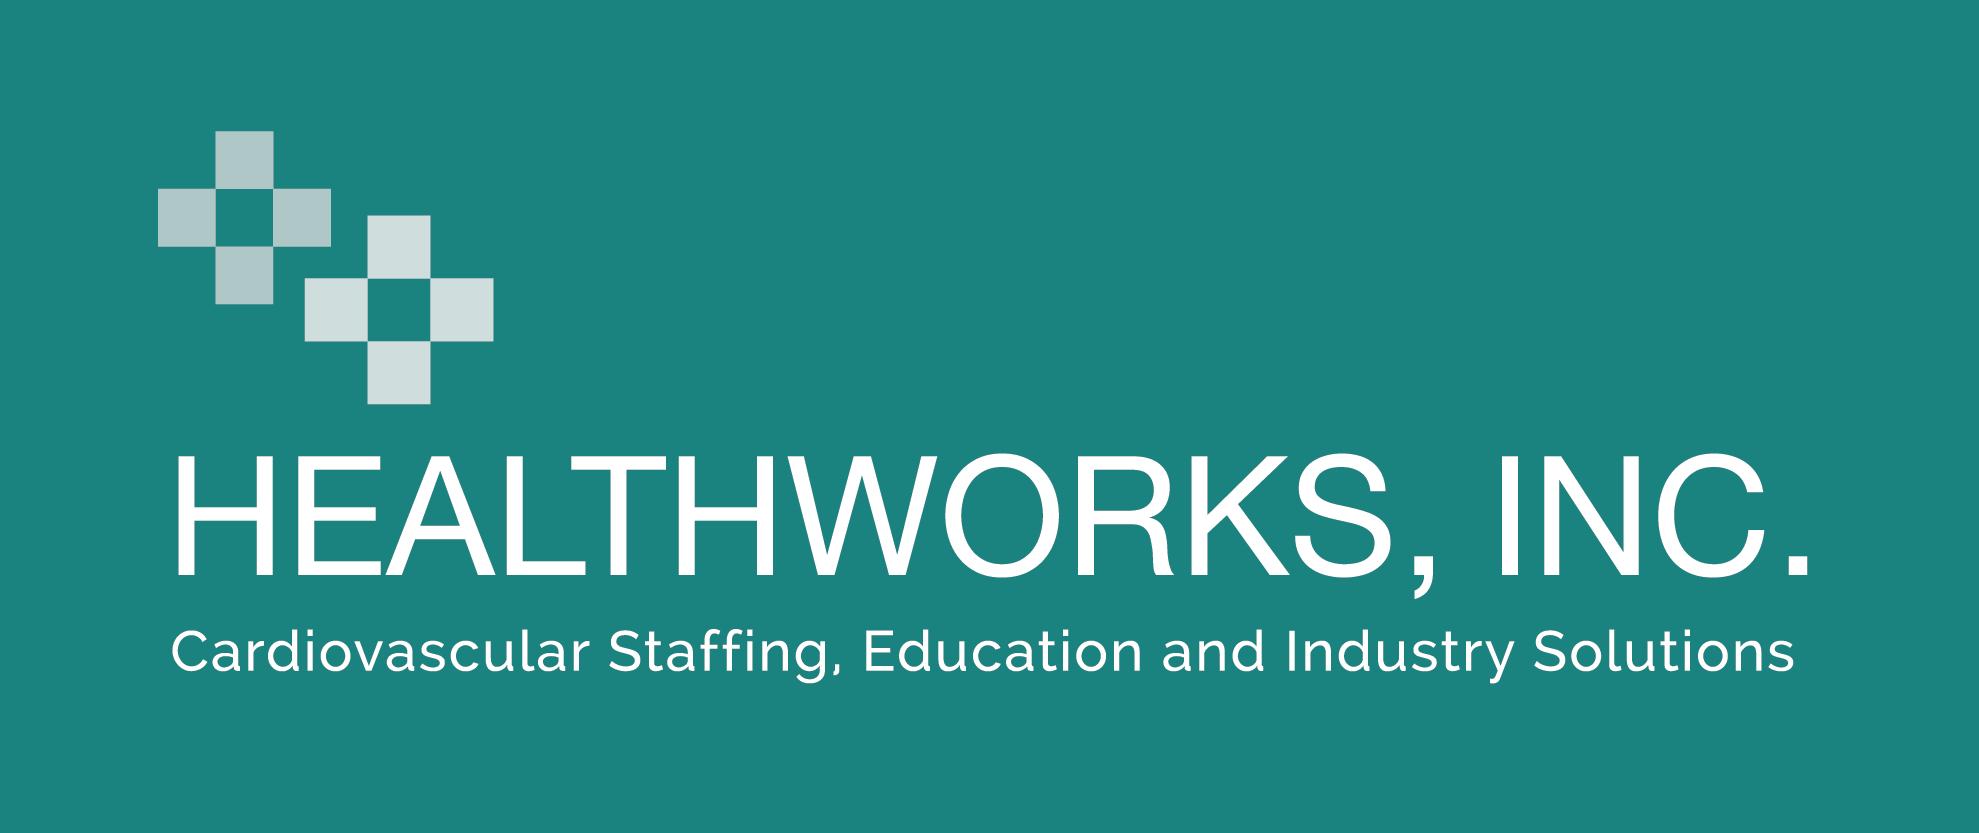 CV Education | United States | Healthworks, Inc.